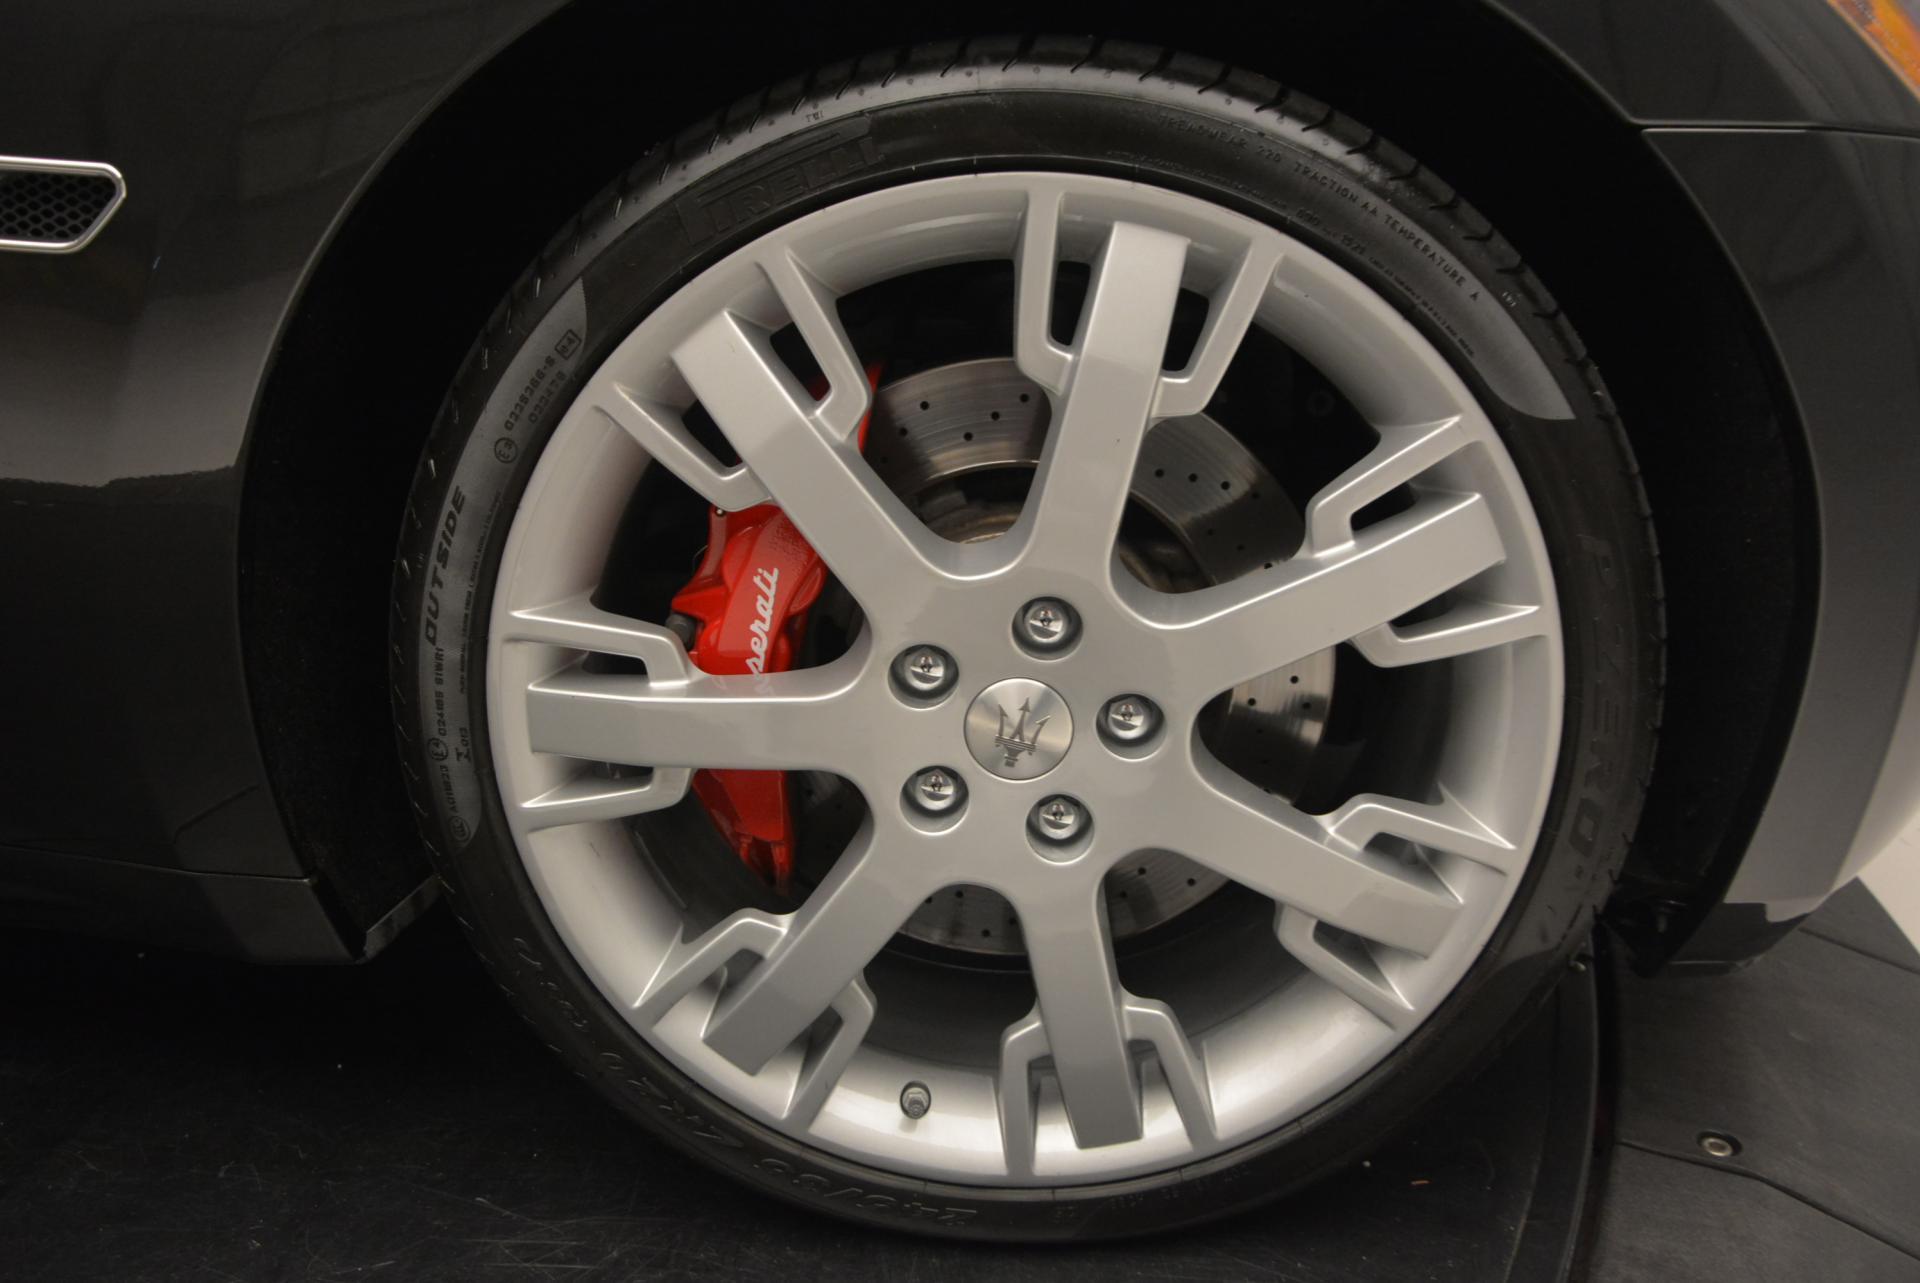 Used 2011 Maserati GranTurismo Base For Sale In Westport, CT 158_p39